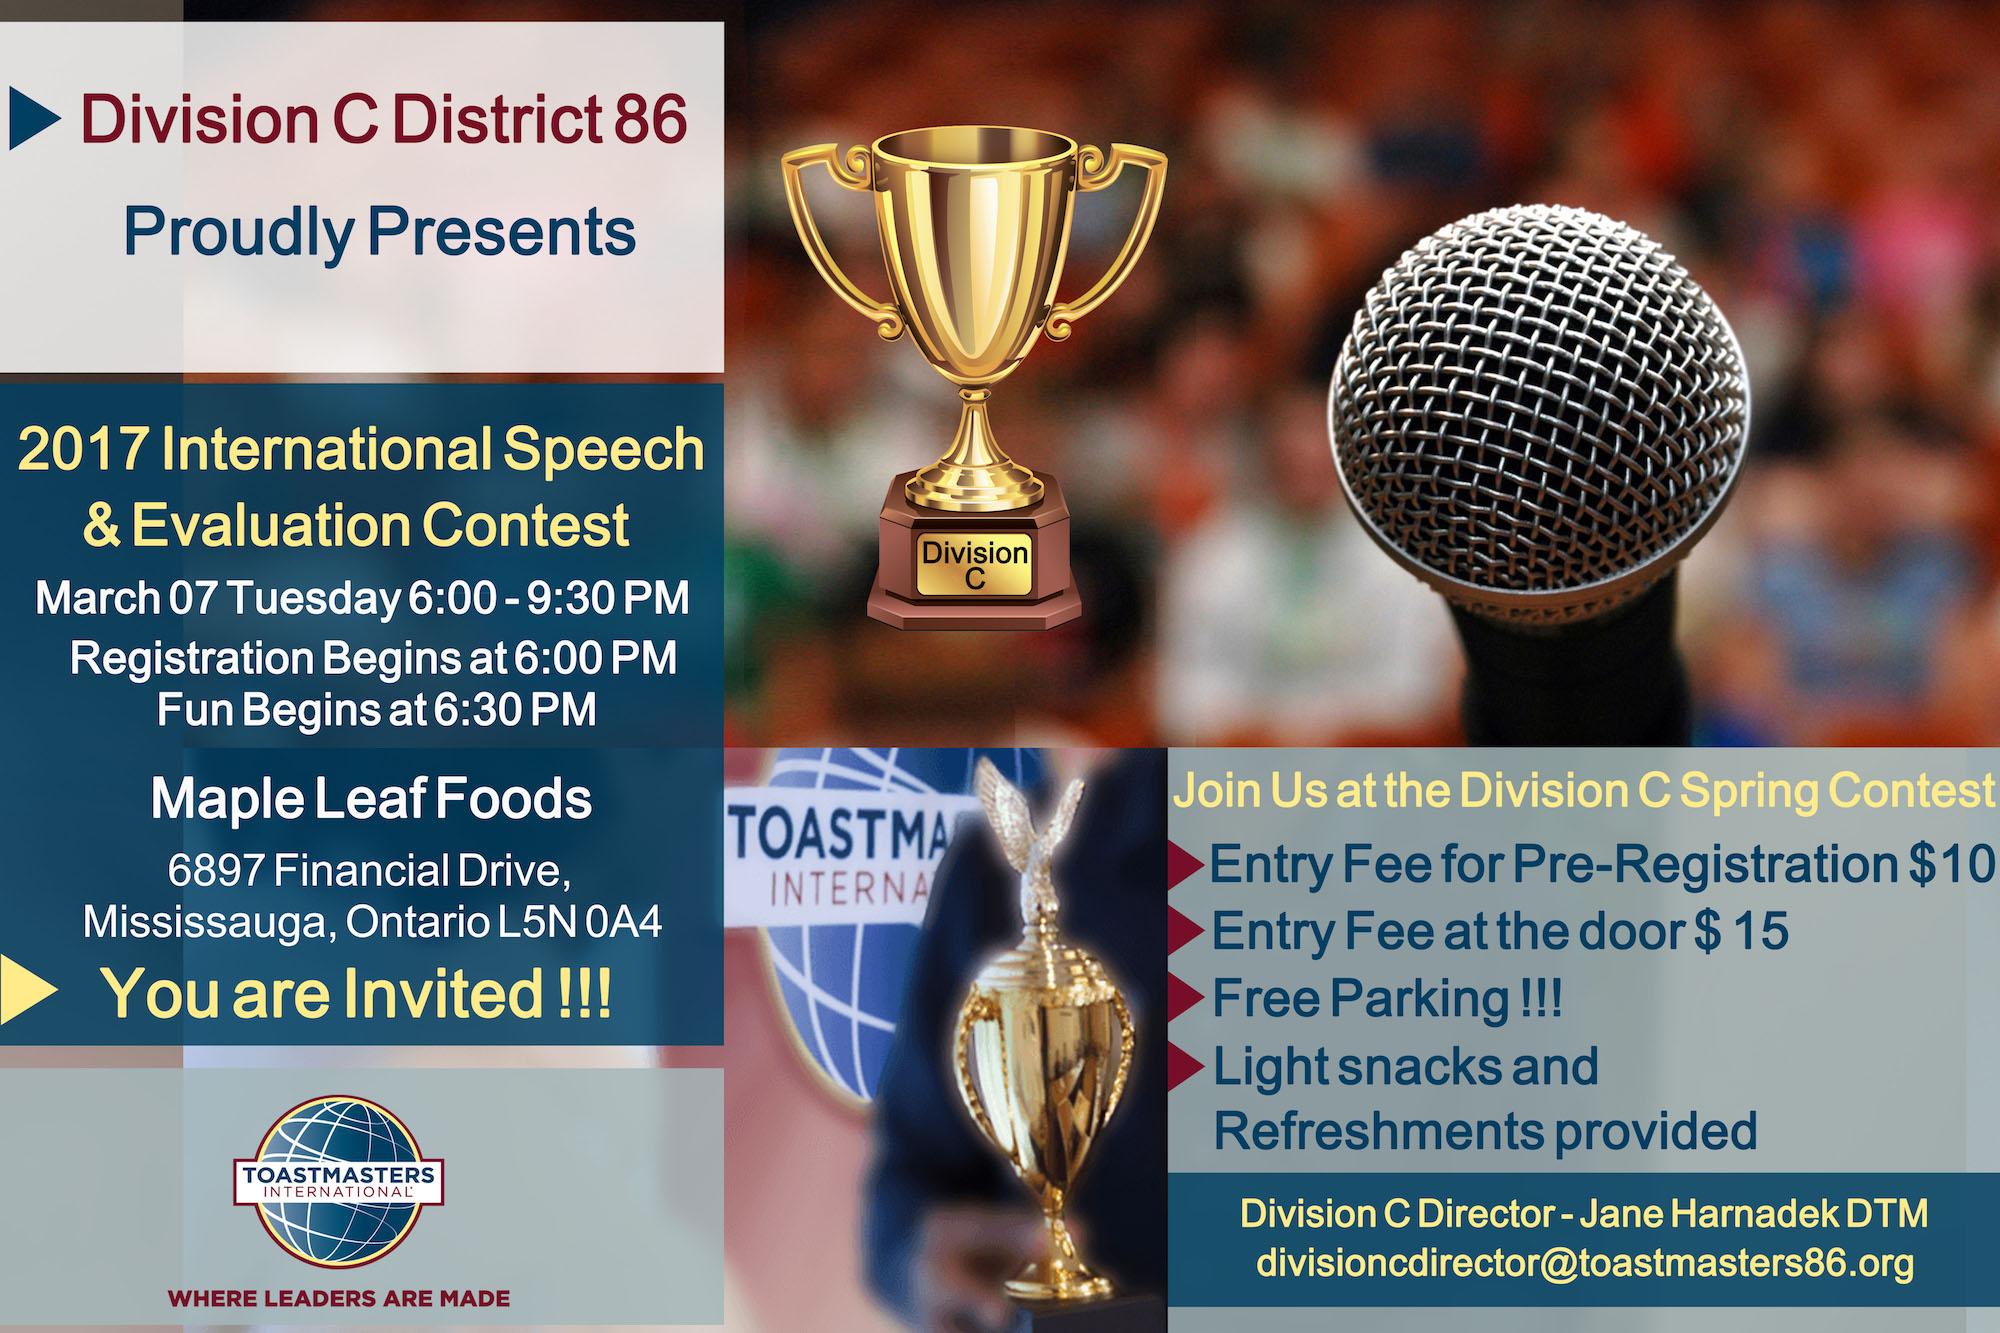 Division C International Speech & Evaluation Contest